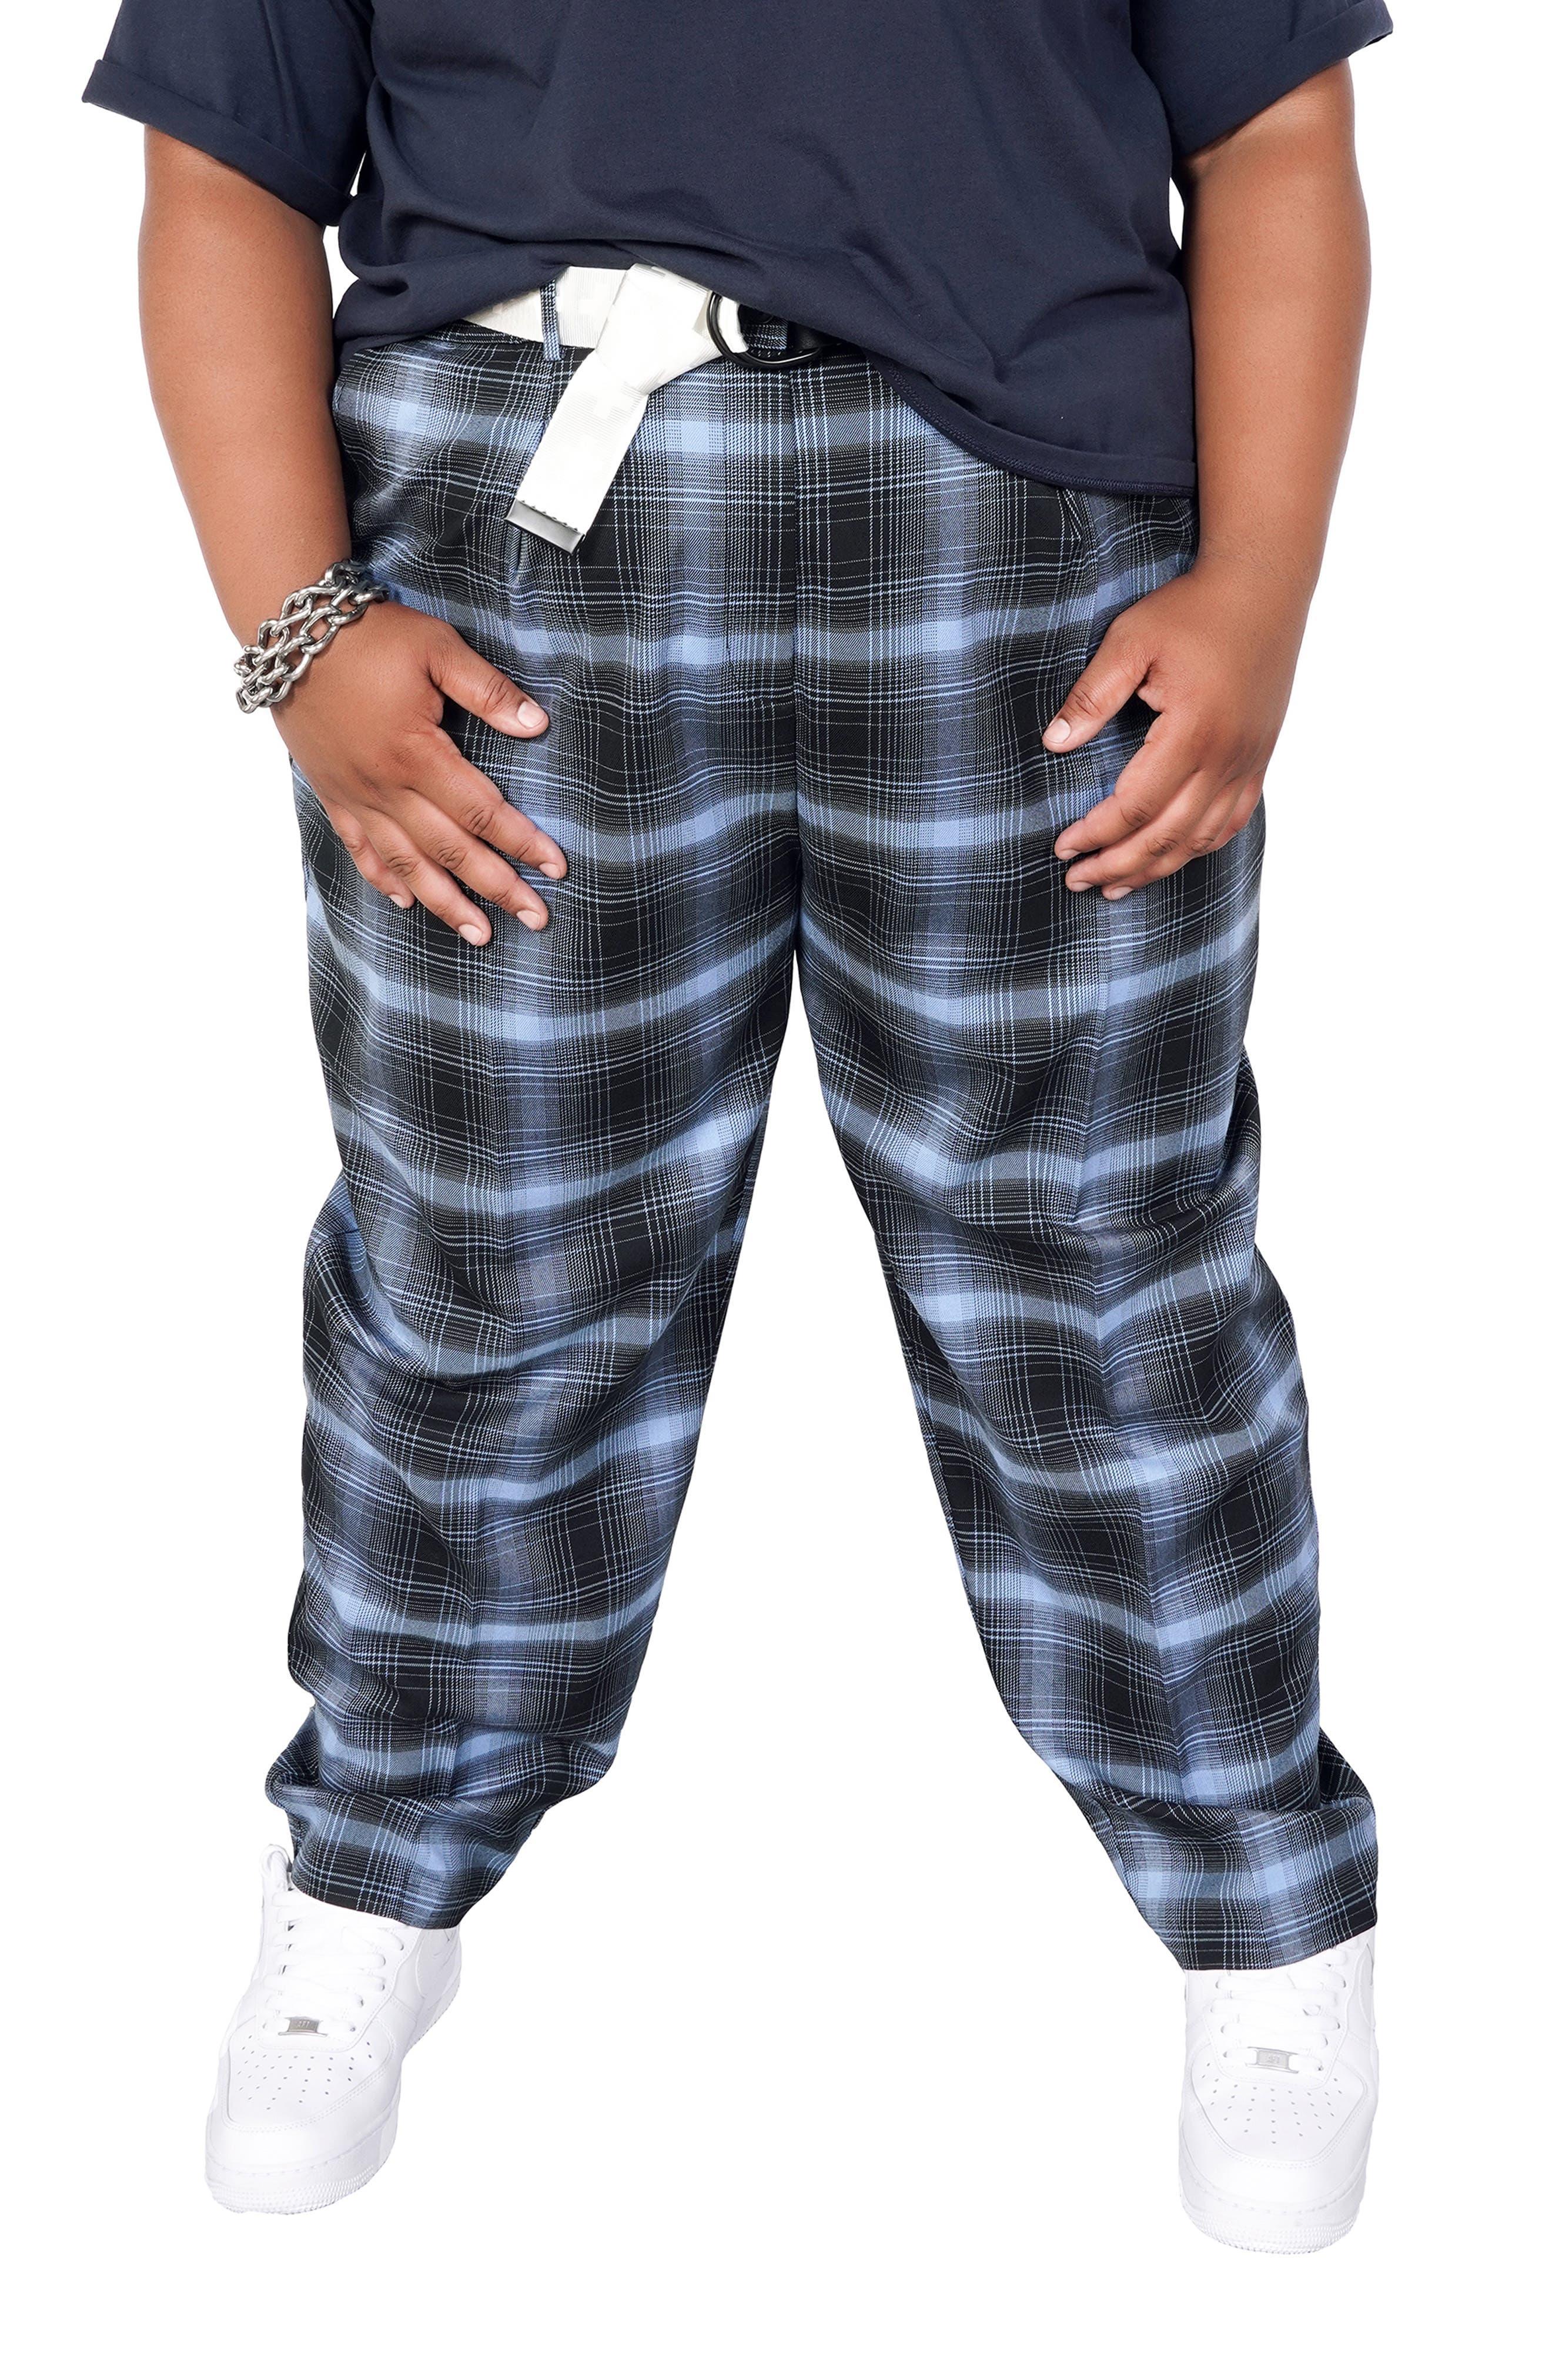 Plus Size Women's Bp. + Wildfang Brushed Plaid Pants